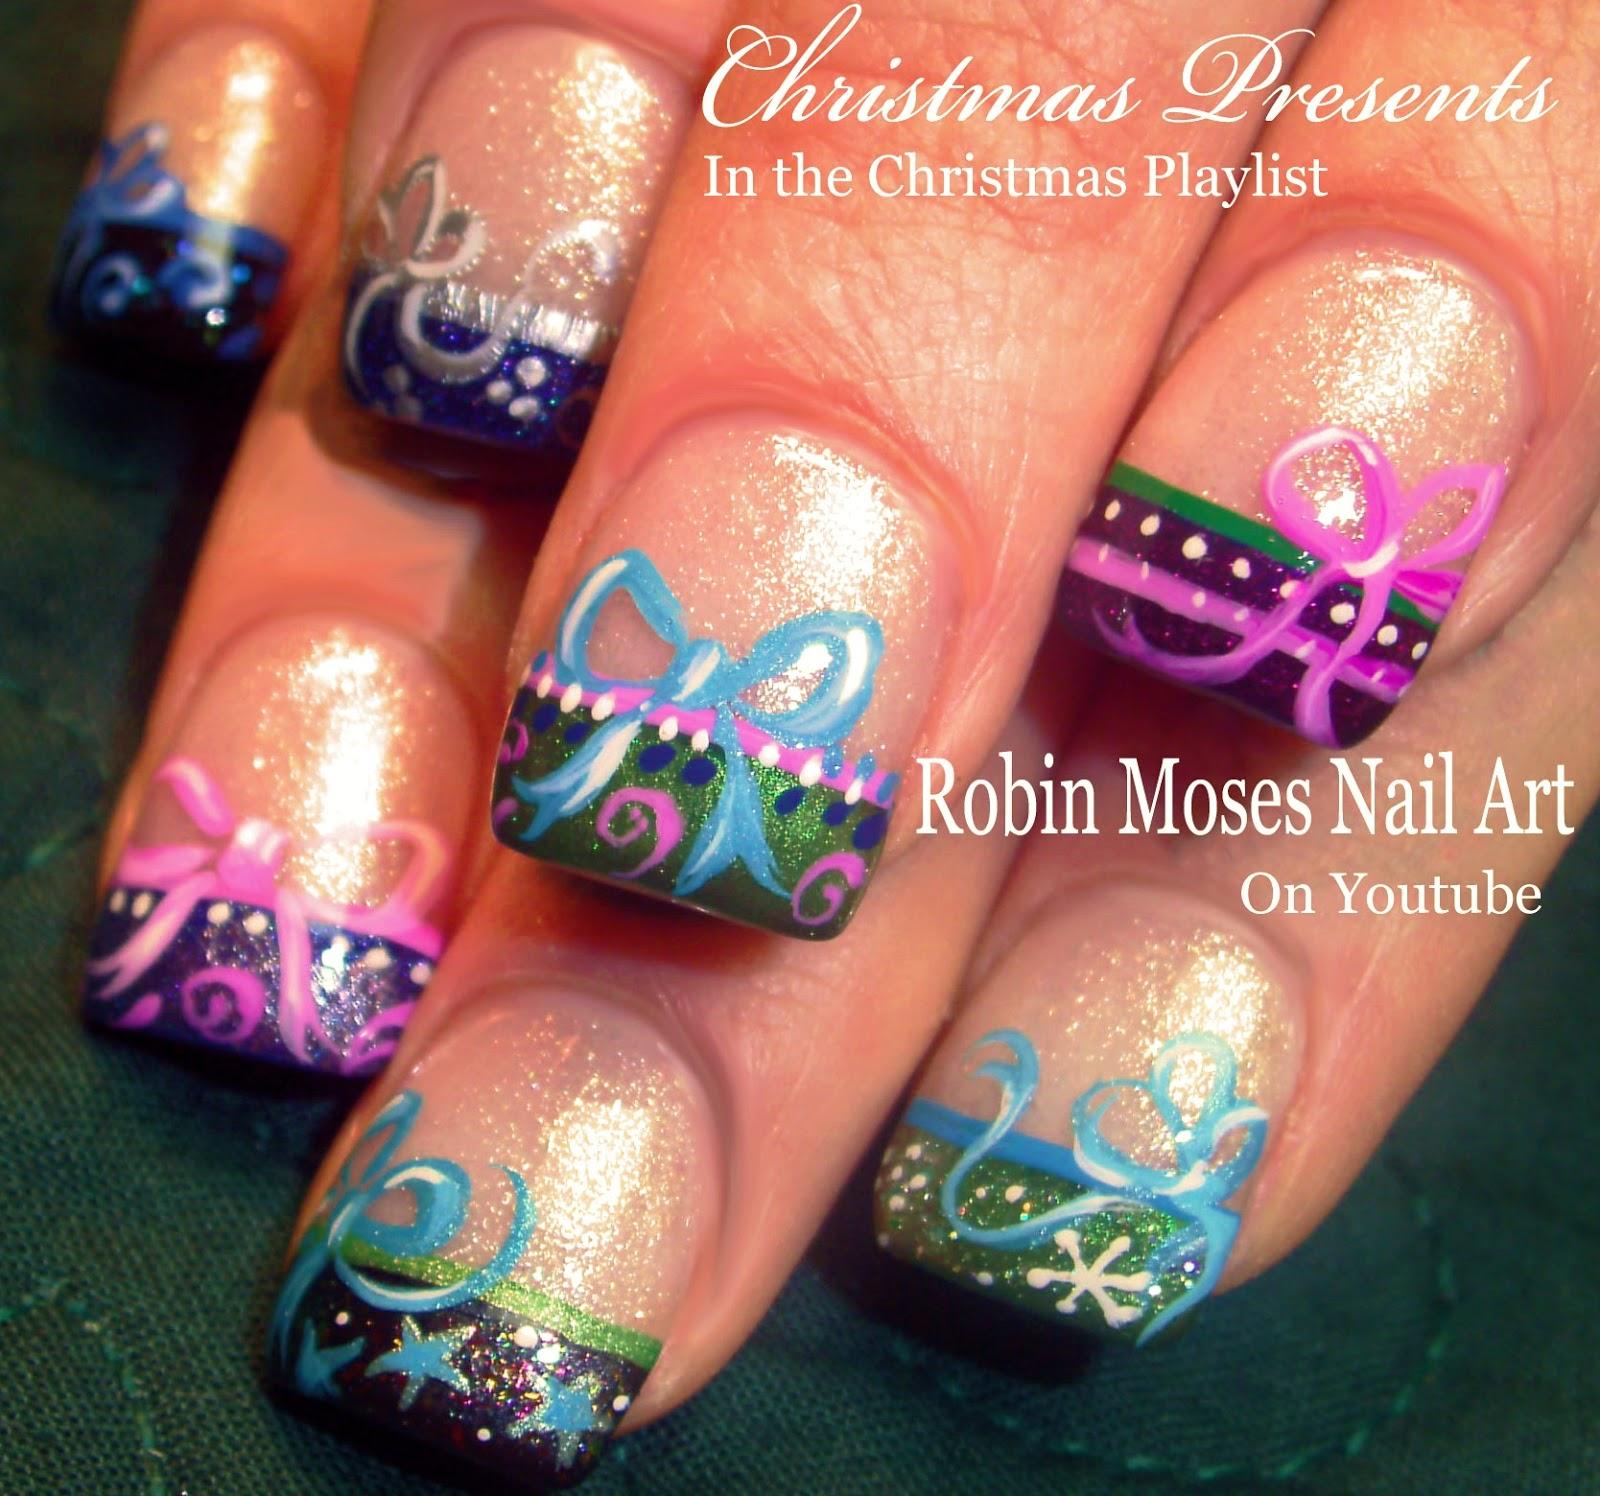 Robin moses nail art christmas bows nail art xmas presents on nail art xmas presents on colorful french tips christmas nails easy christmas ideas prinsesfo Gallery